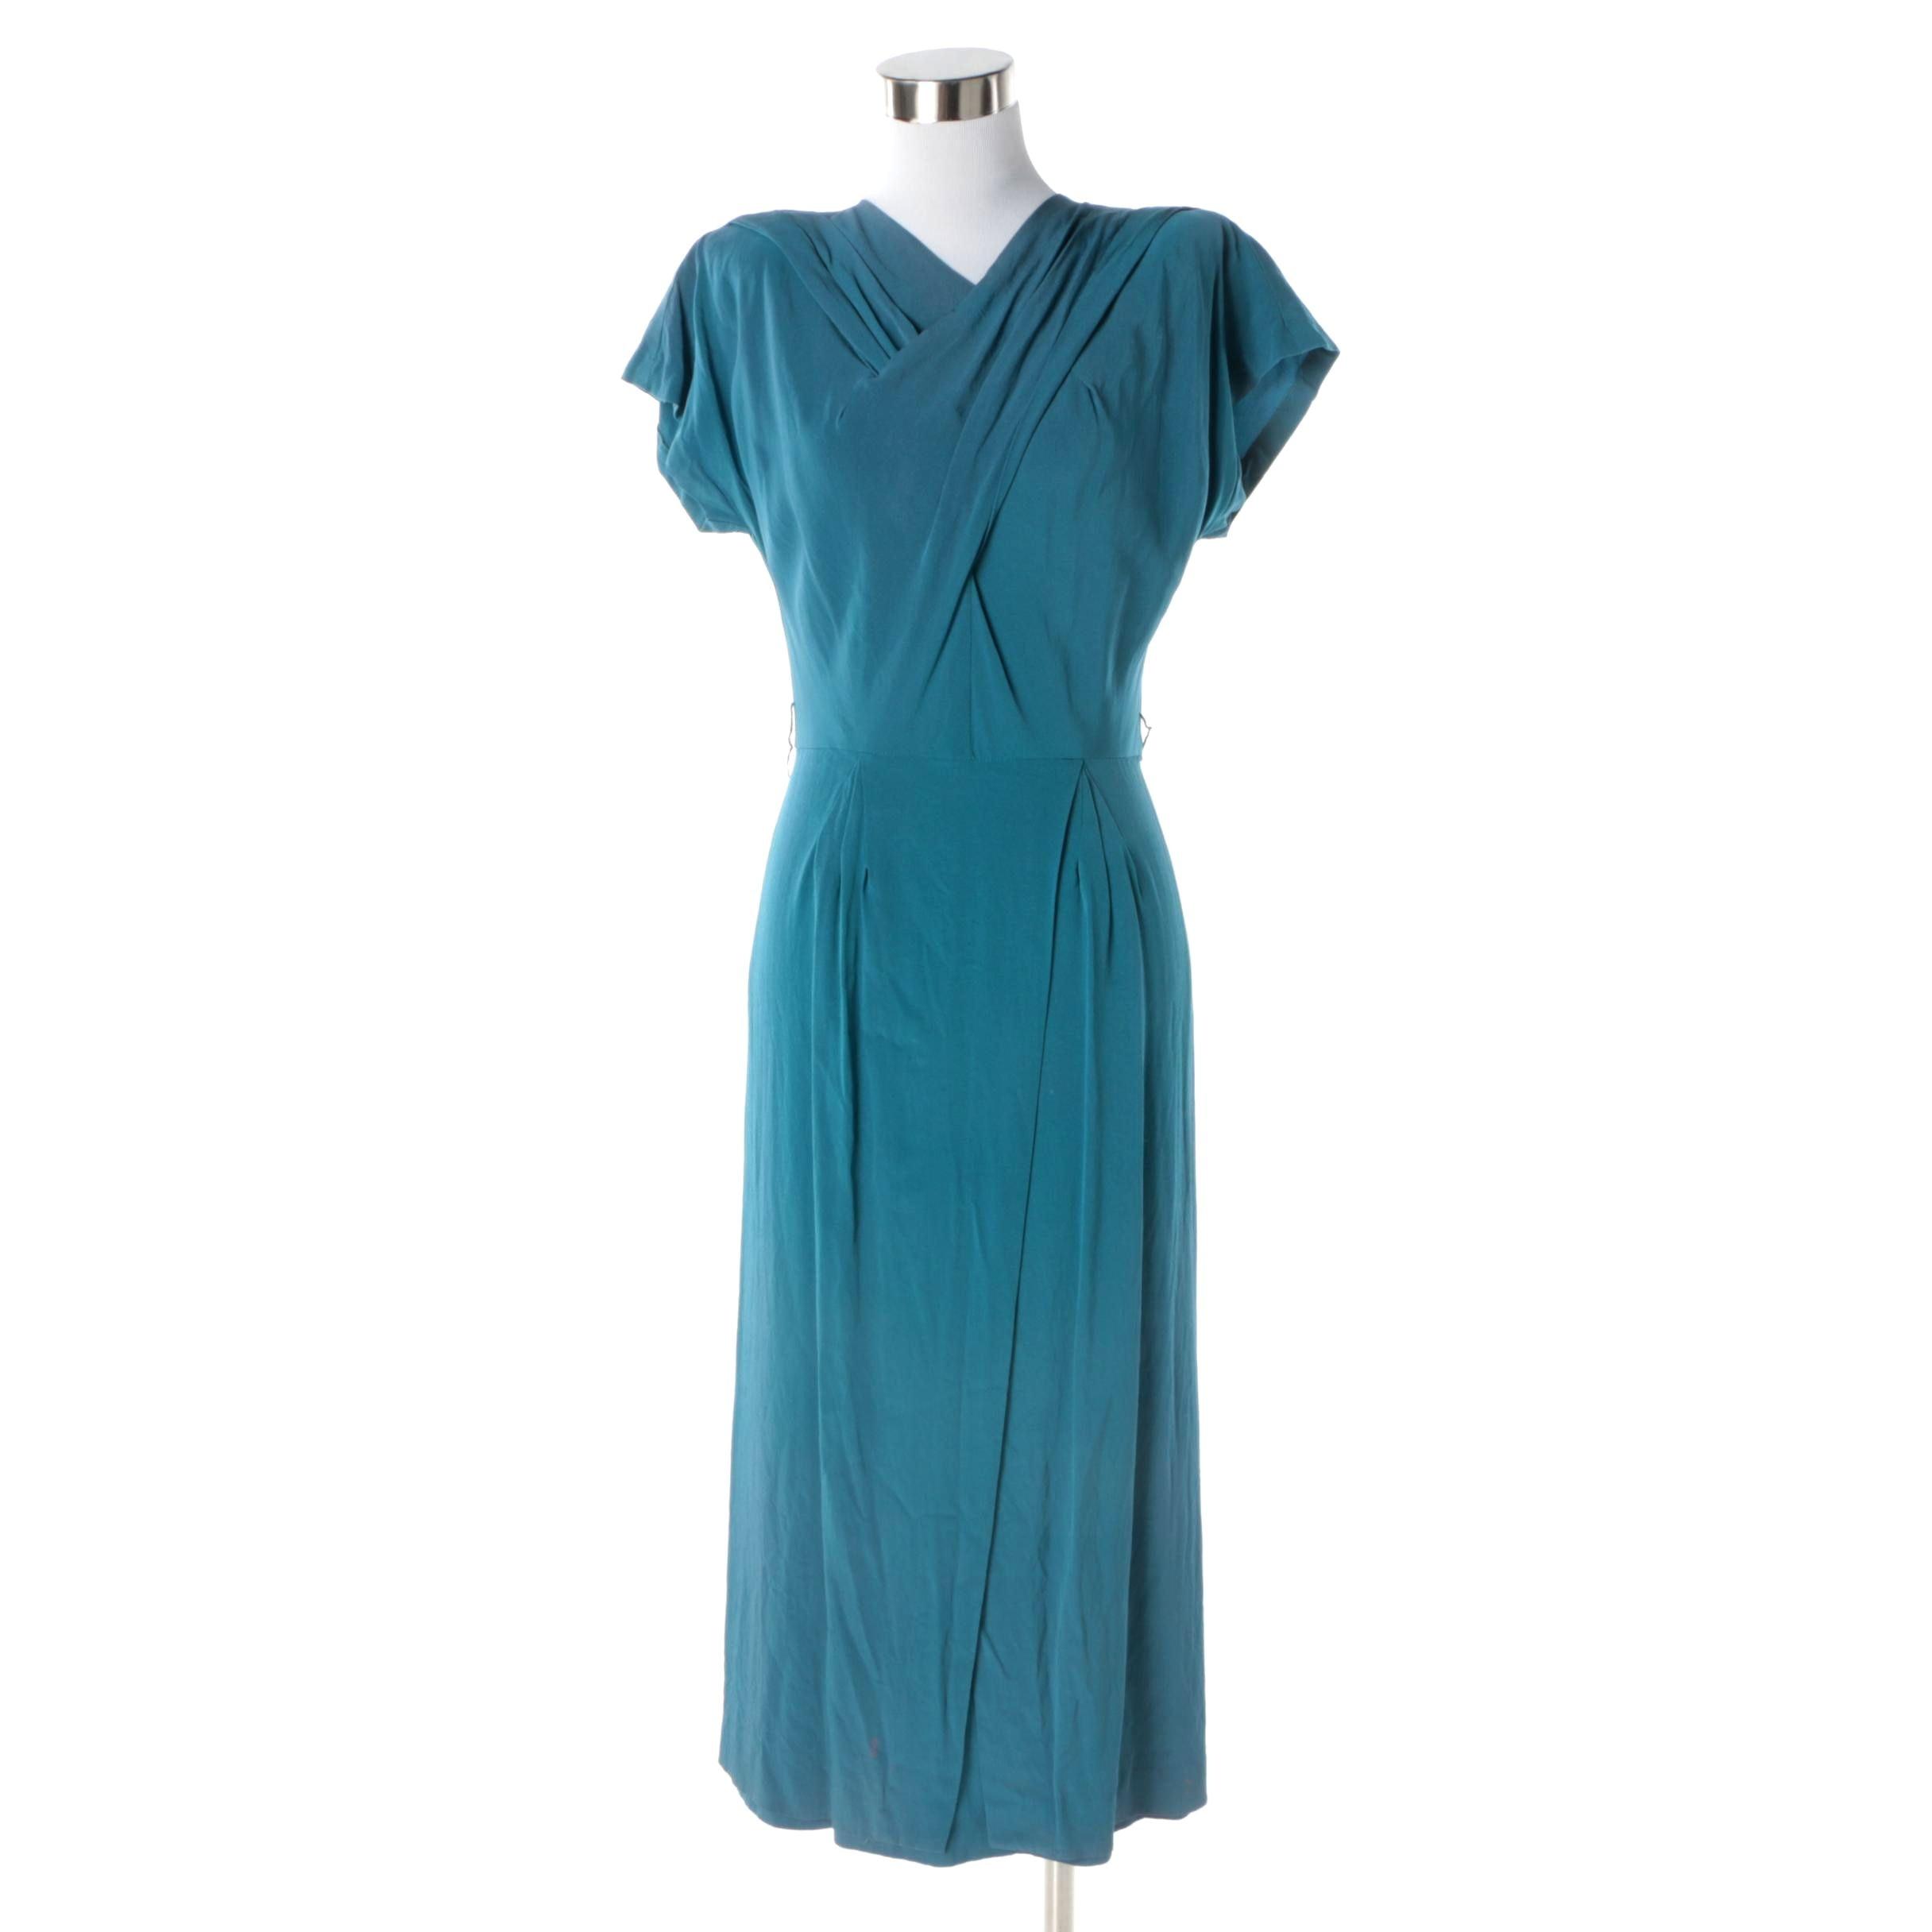 1930s Vintage Blue Ruched Day Dress